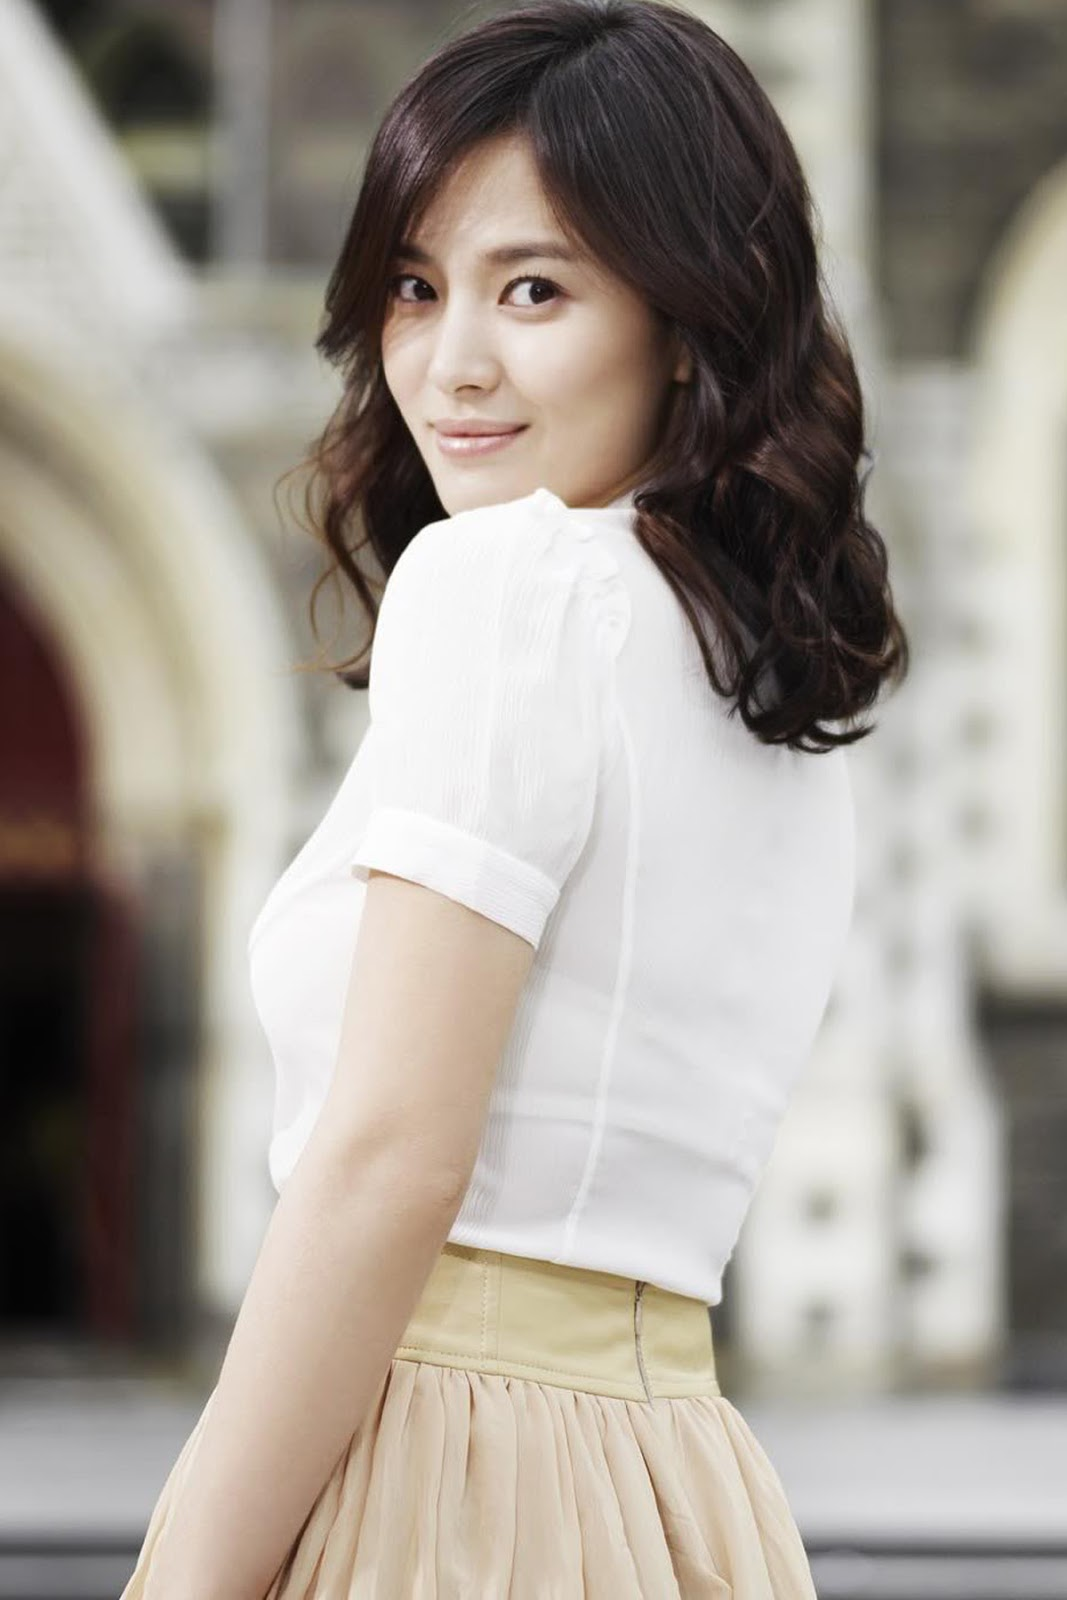 Song Hye Kyo Hd Wallpapers